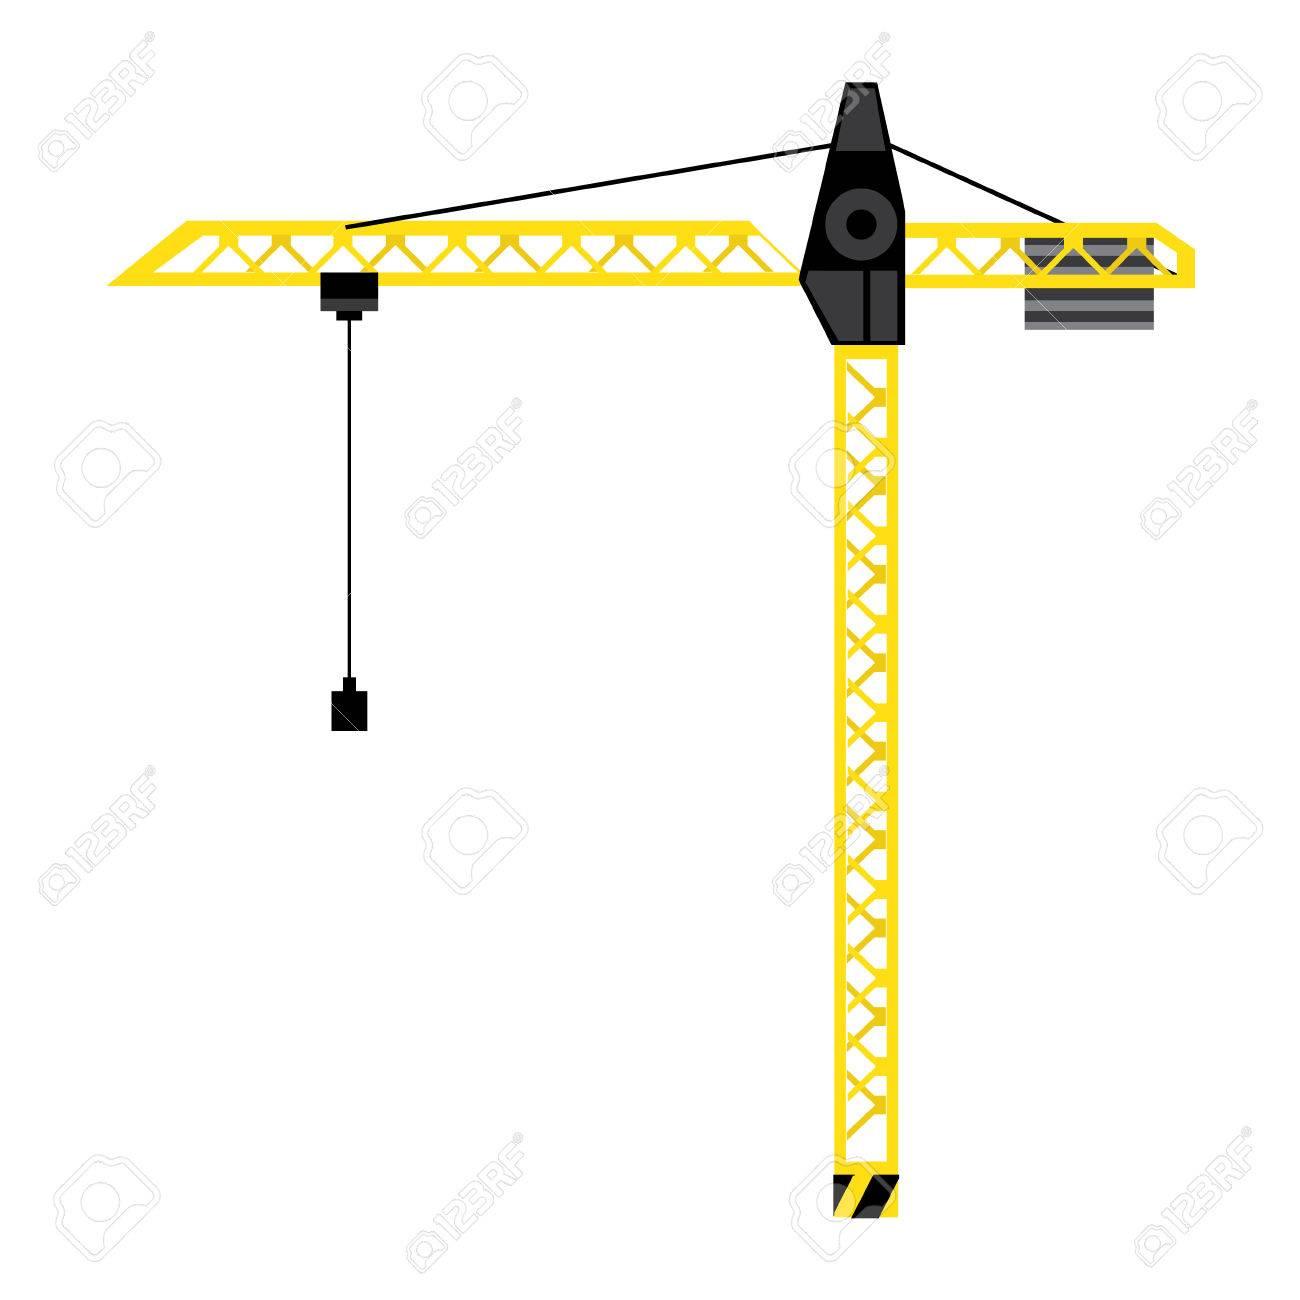 Vector illustration yellow construction crane tower  Crane flat